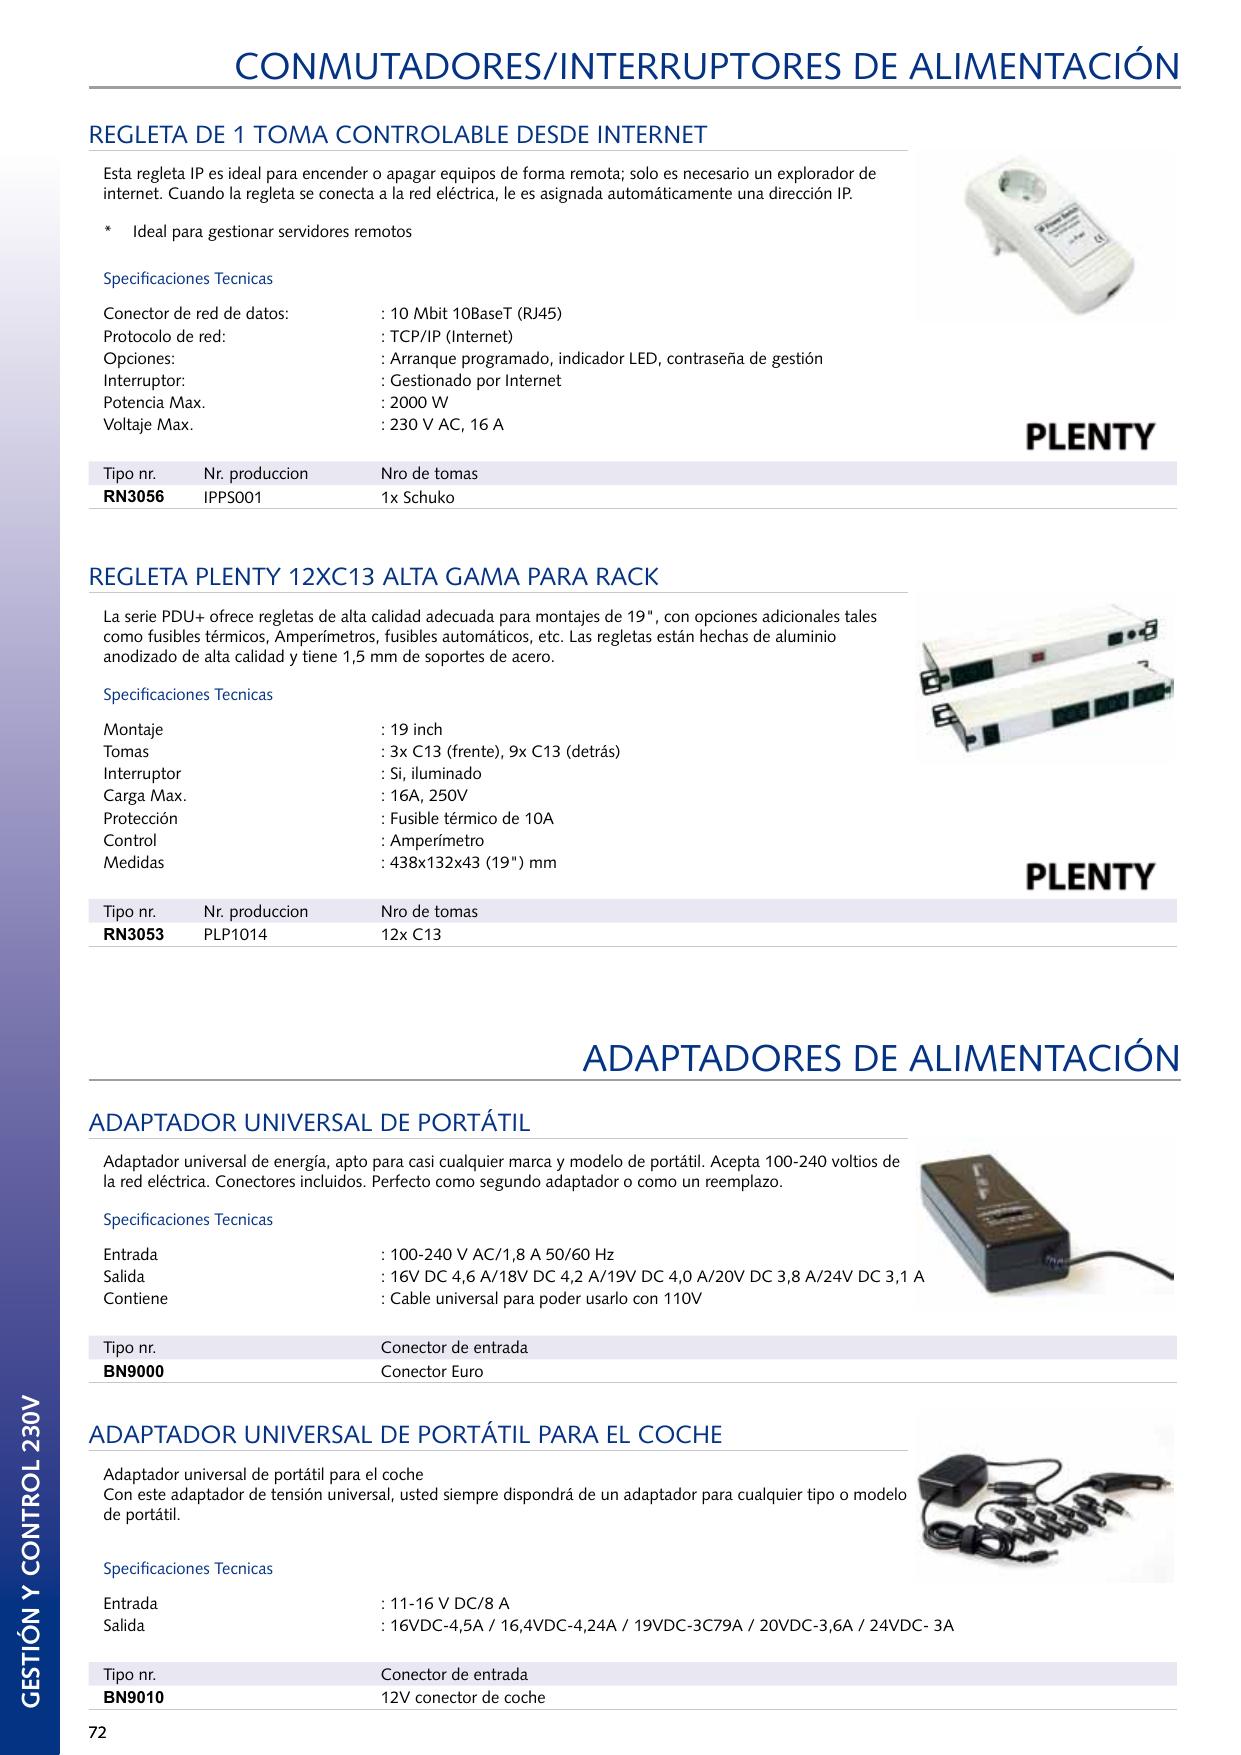 Adaptador de fuente de alimentaci/ón 5V 2A para c/ámaras de seguridad Cargador de pared Z/ócalo est/ándar europeo Entrada AC 100V-240V Salida DC 5V Cable de alimentaci/ón de AC a DC de 1,5 metros